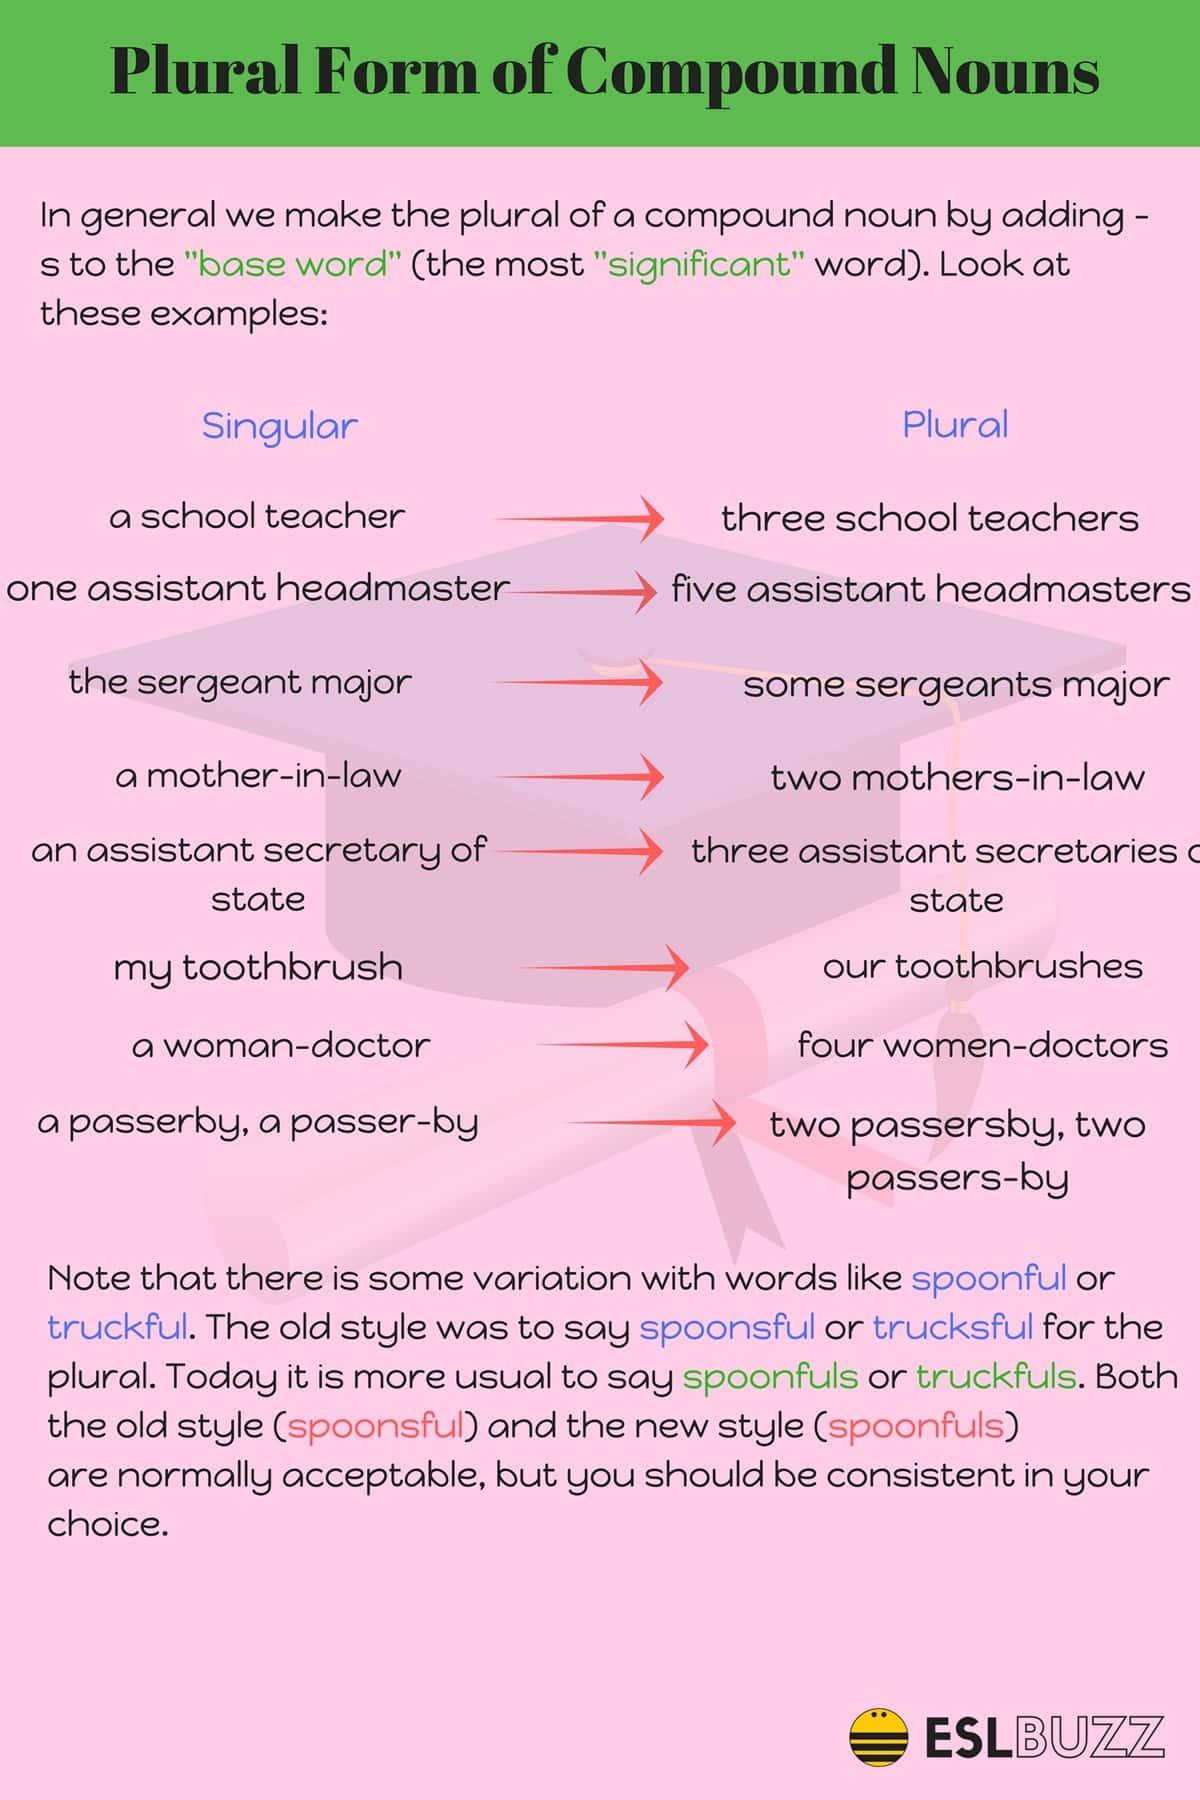 Plural Forms of Compound Nouns